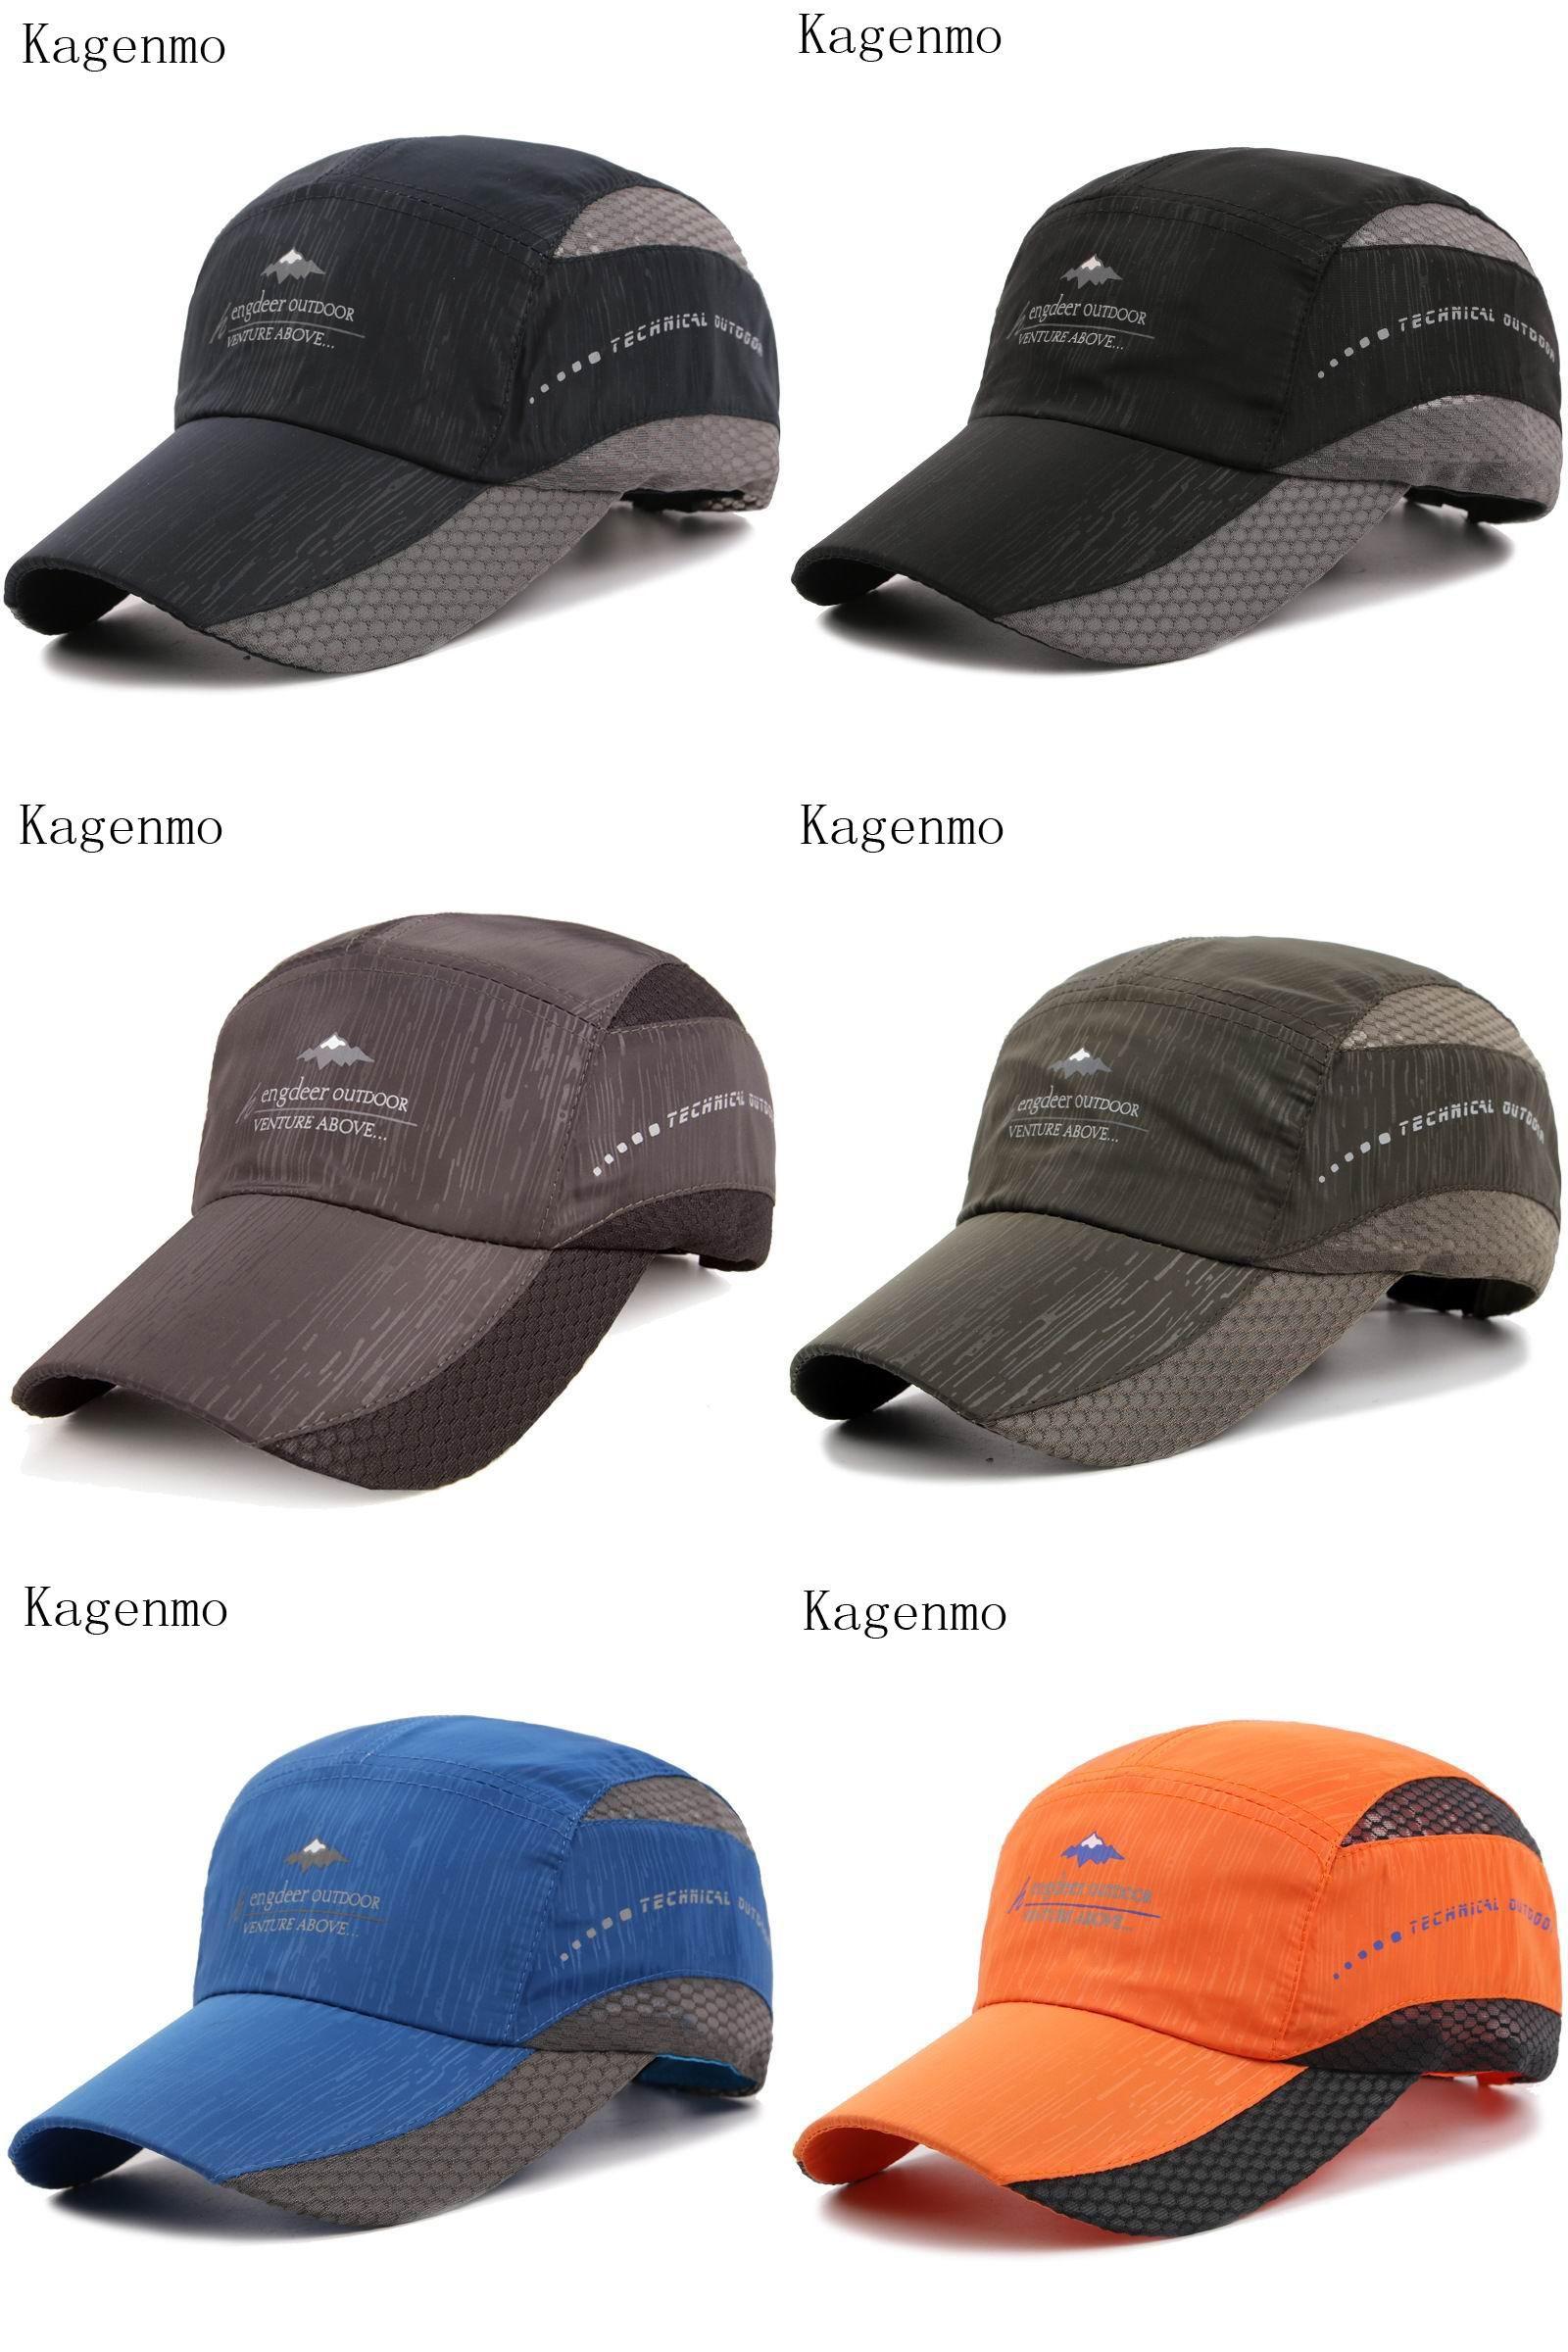 1ecec687cfc  Visit to Buy  Kagenmo Quick dry sports men baseball cap outdoor fishing  men hat